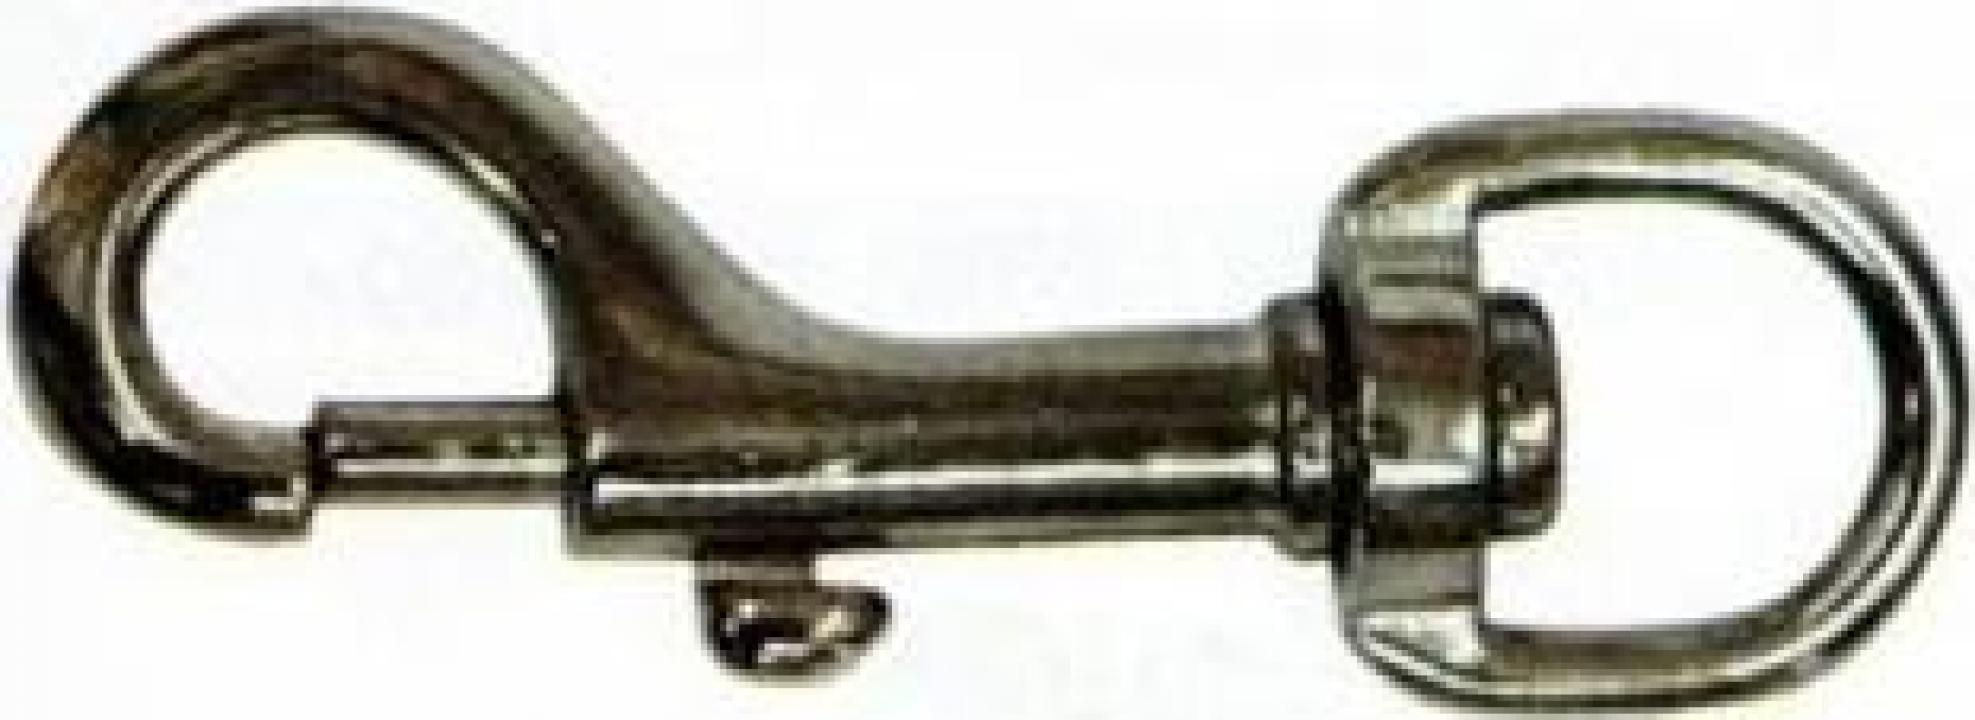 Carabina rapida Strend Pro 99-4, dimensiune 8.5x85 mm, zinc